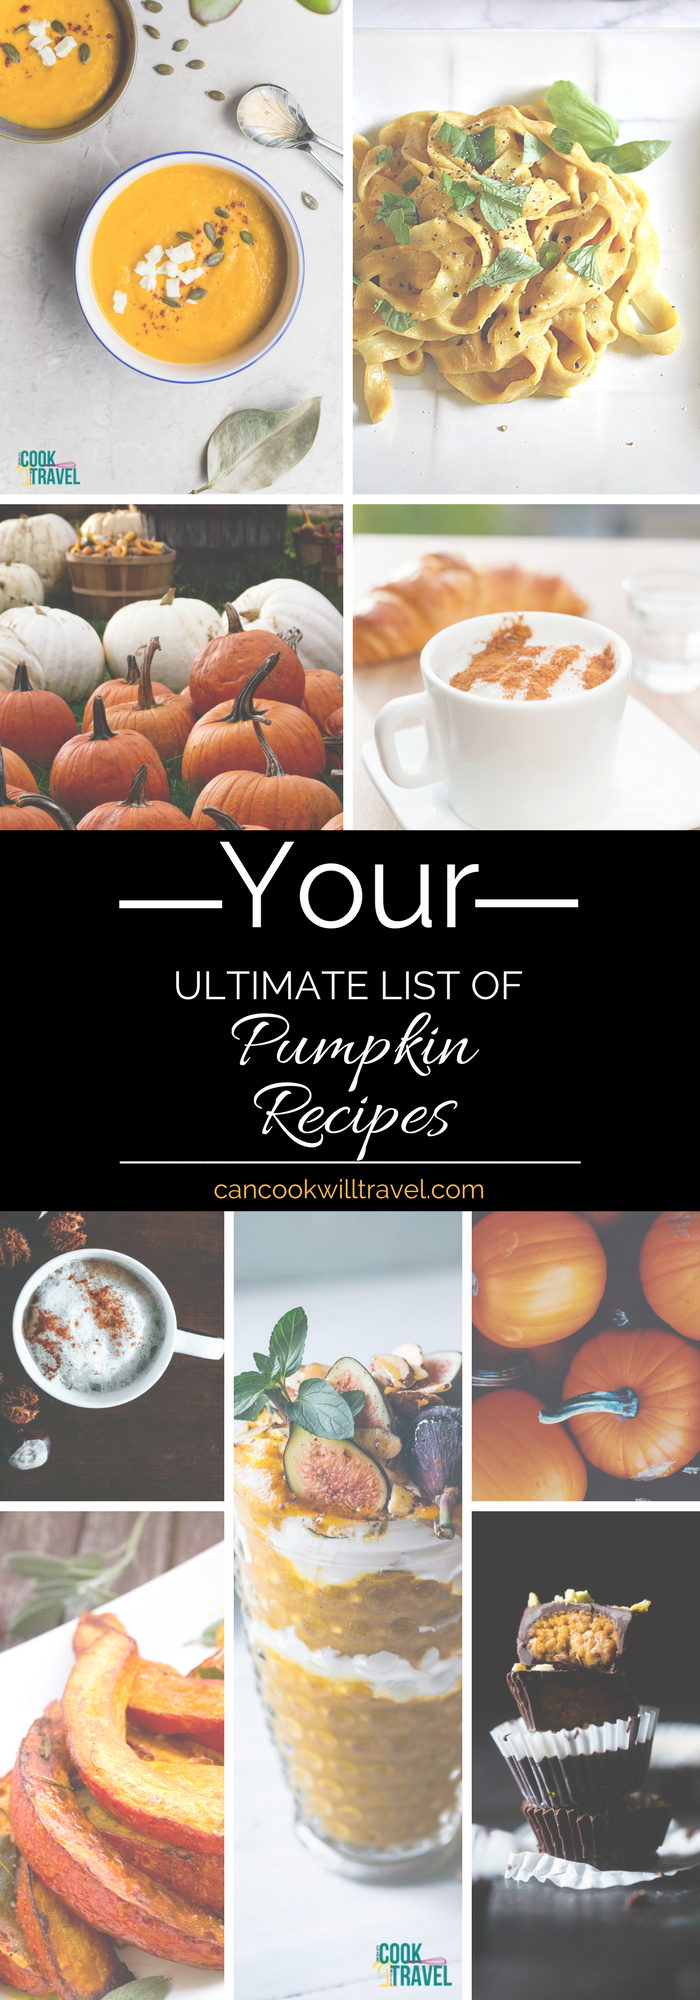 Ultimate Pumpkin Recipes